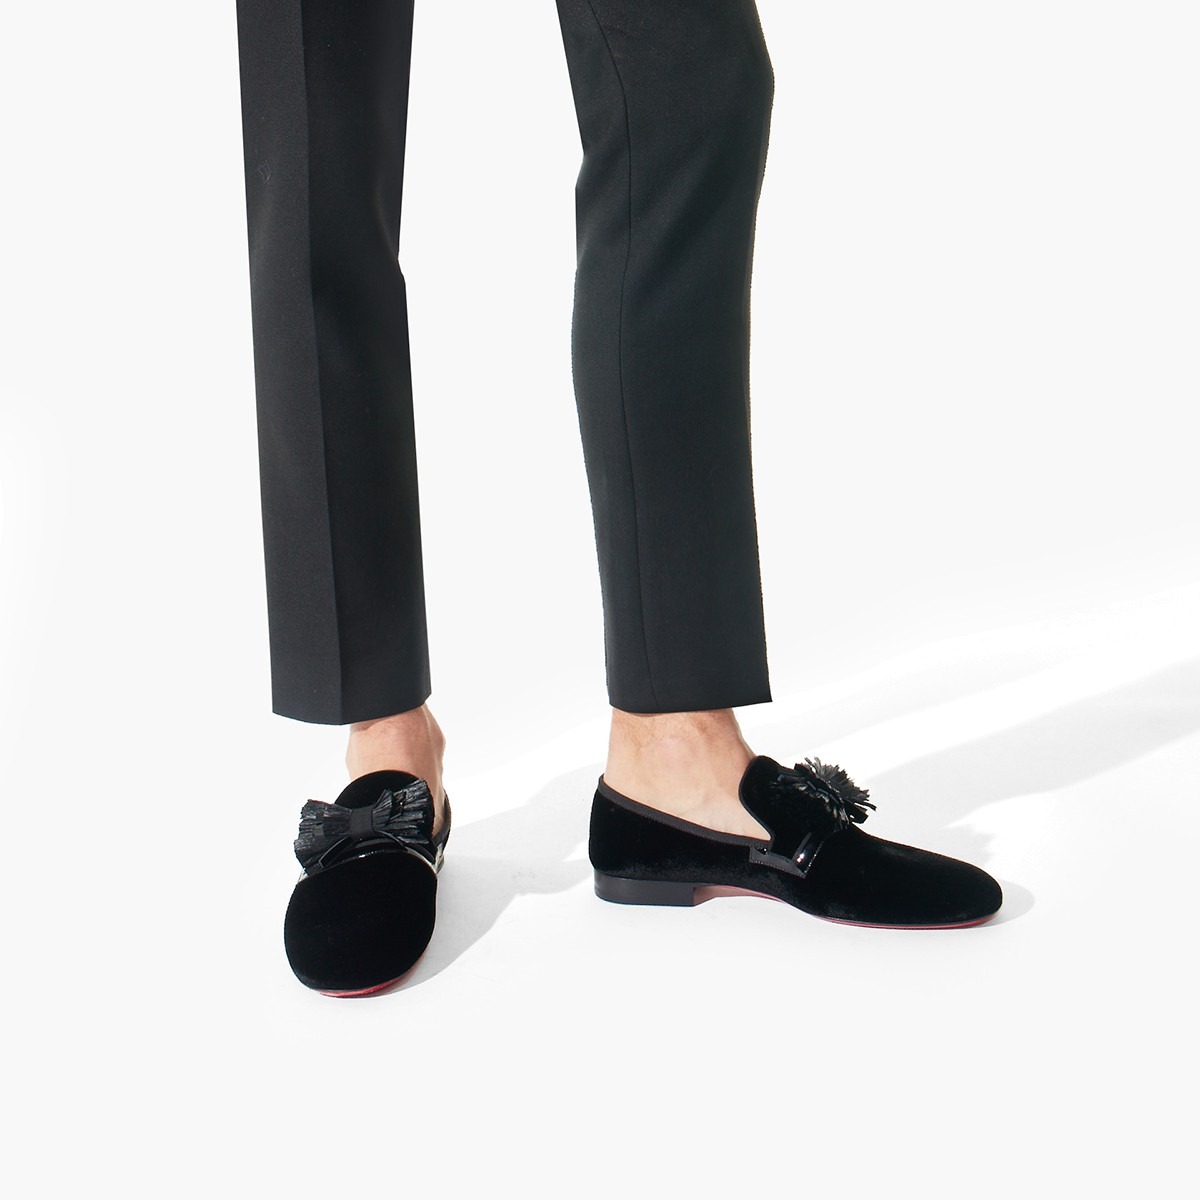 Shoes - Rafinodo Flat - Christian Louboutin